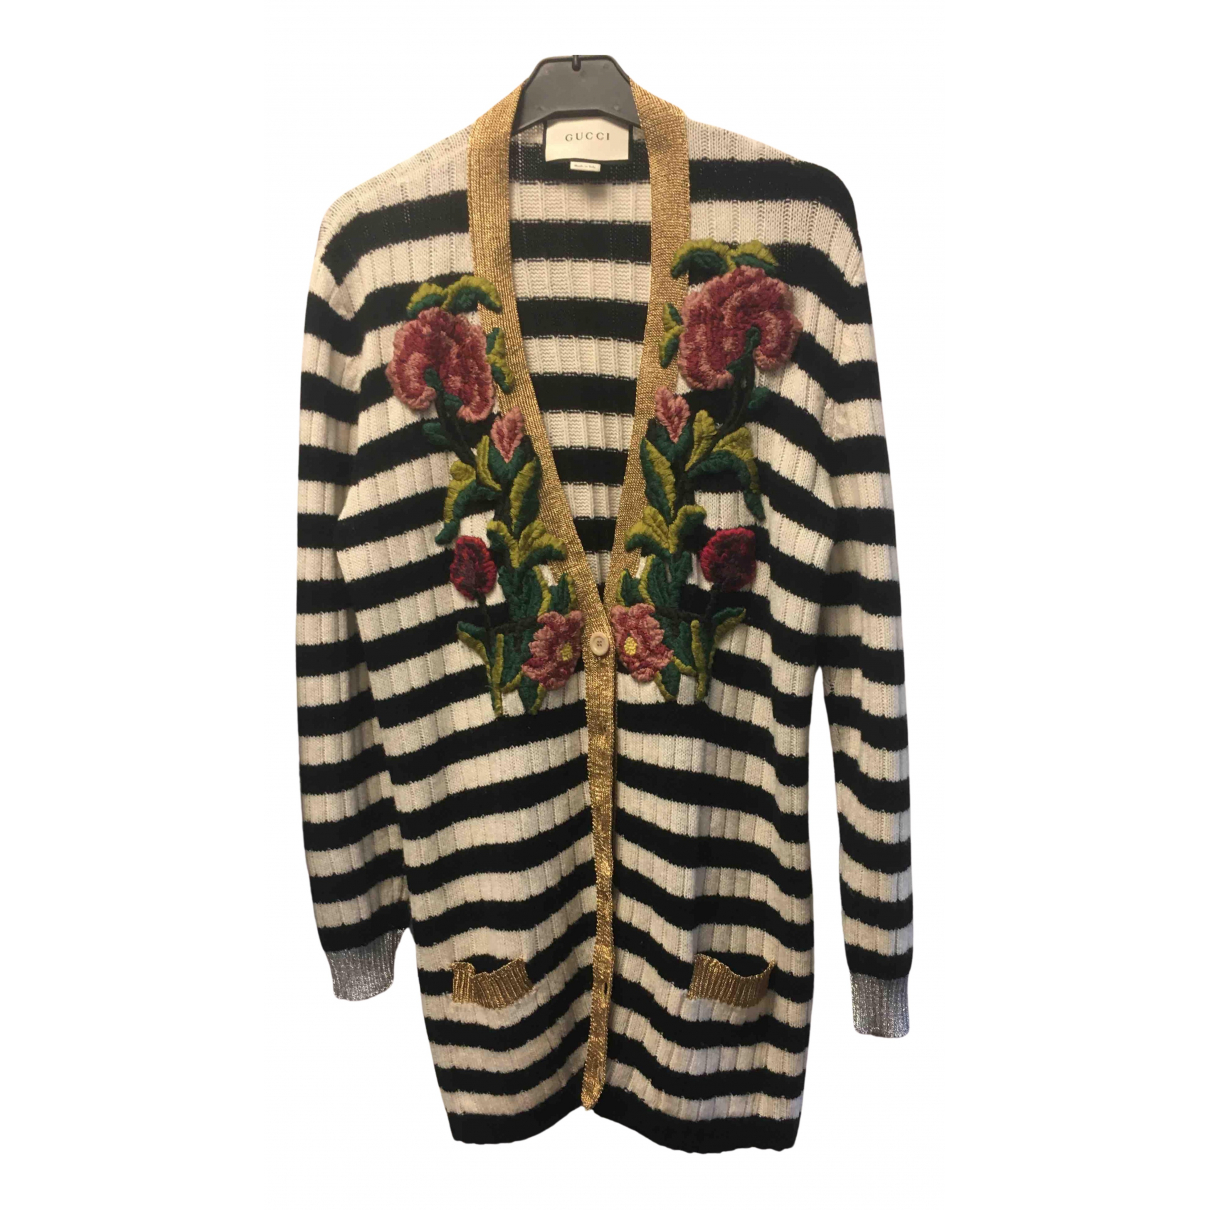 Gucci N Multicolour Wool coat for Women M International